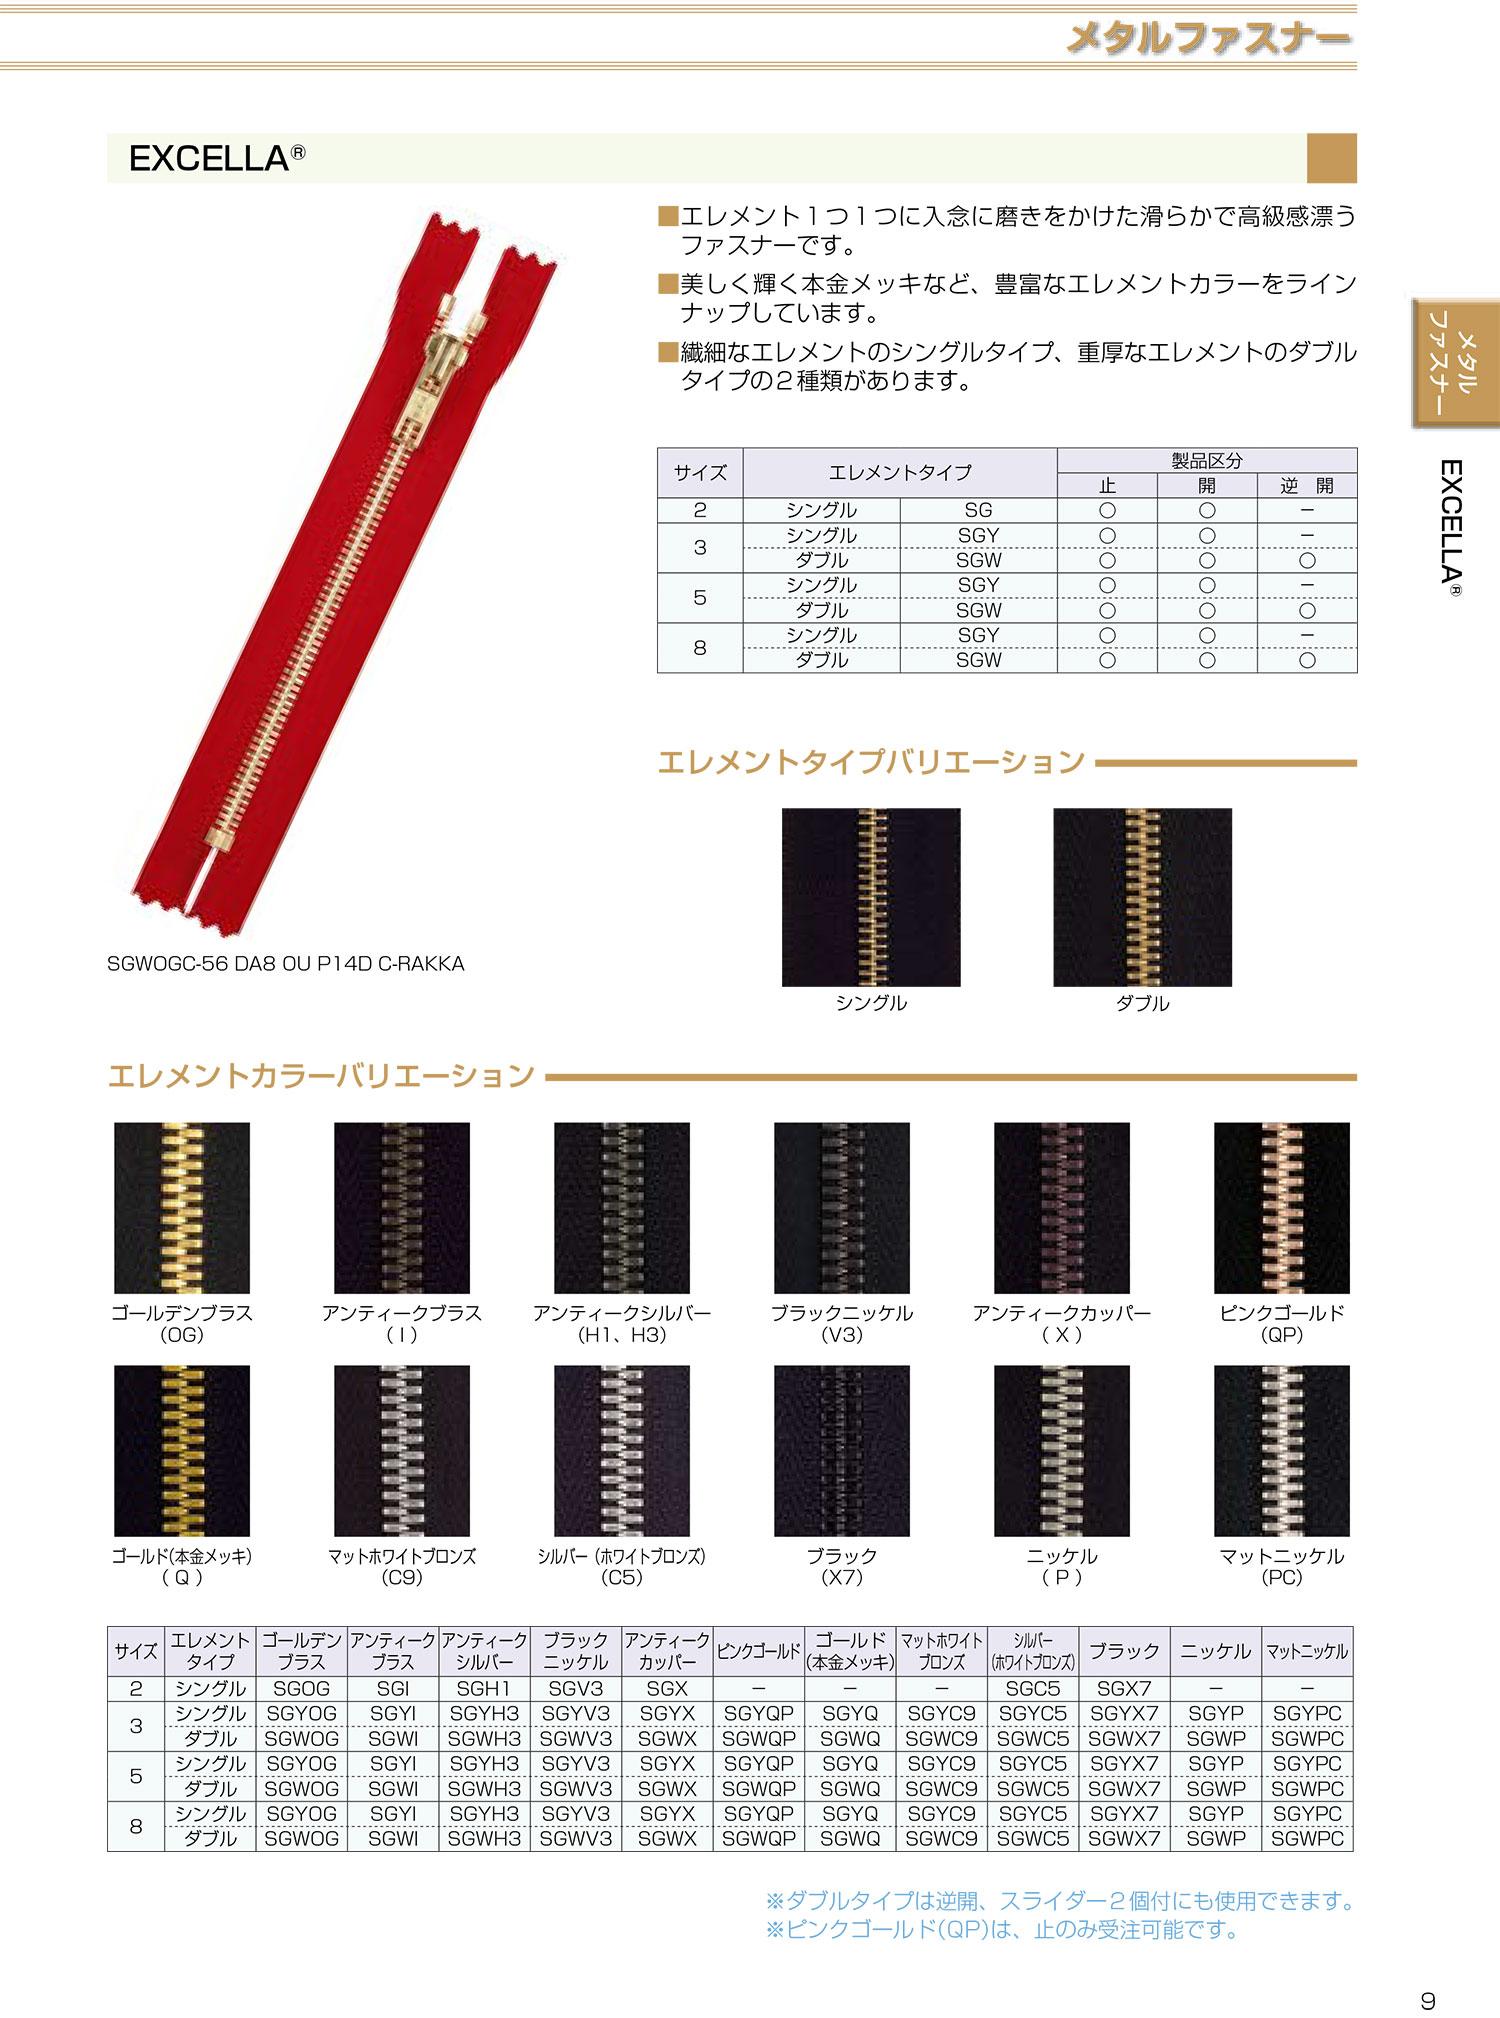 2SGOGOR エクセラ 2サイズ ゴールデンブラス オープン シングル[ファスナー] YKK/オークラ商事 - ApparelX アパレル資材卸通販